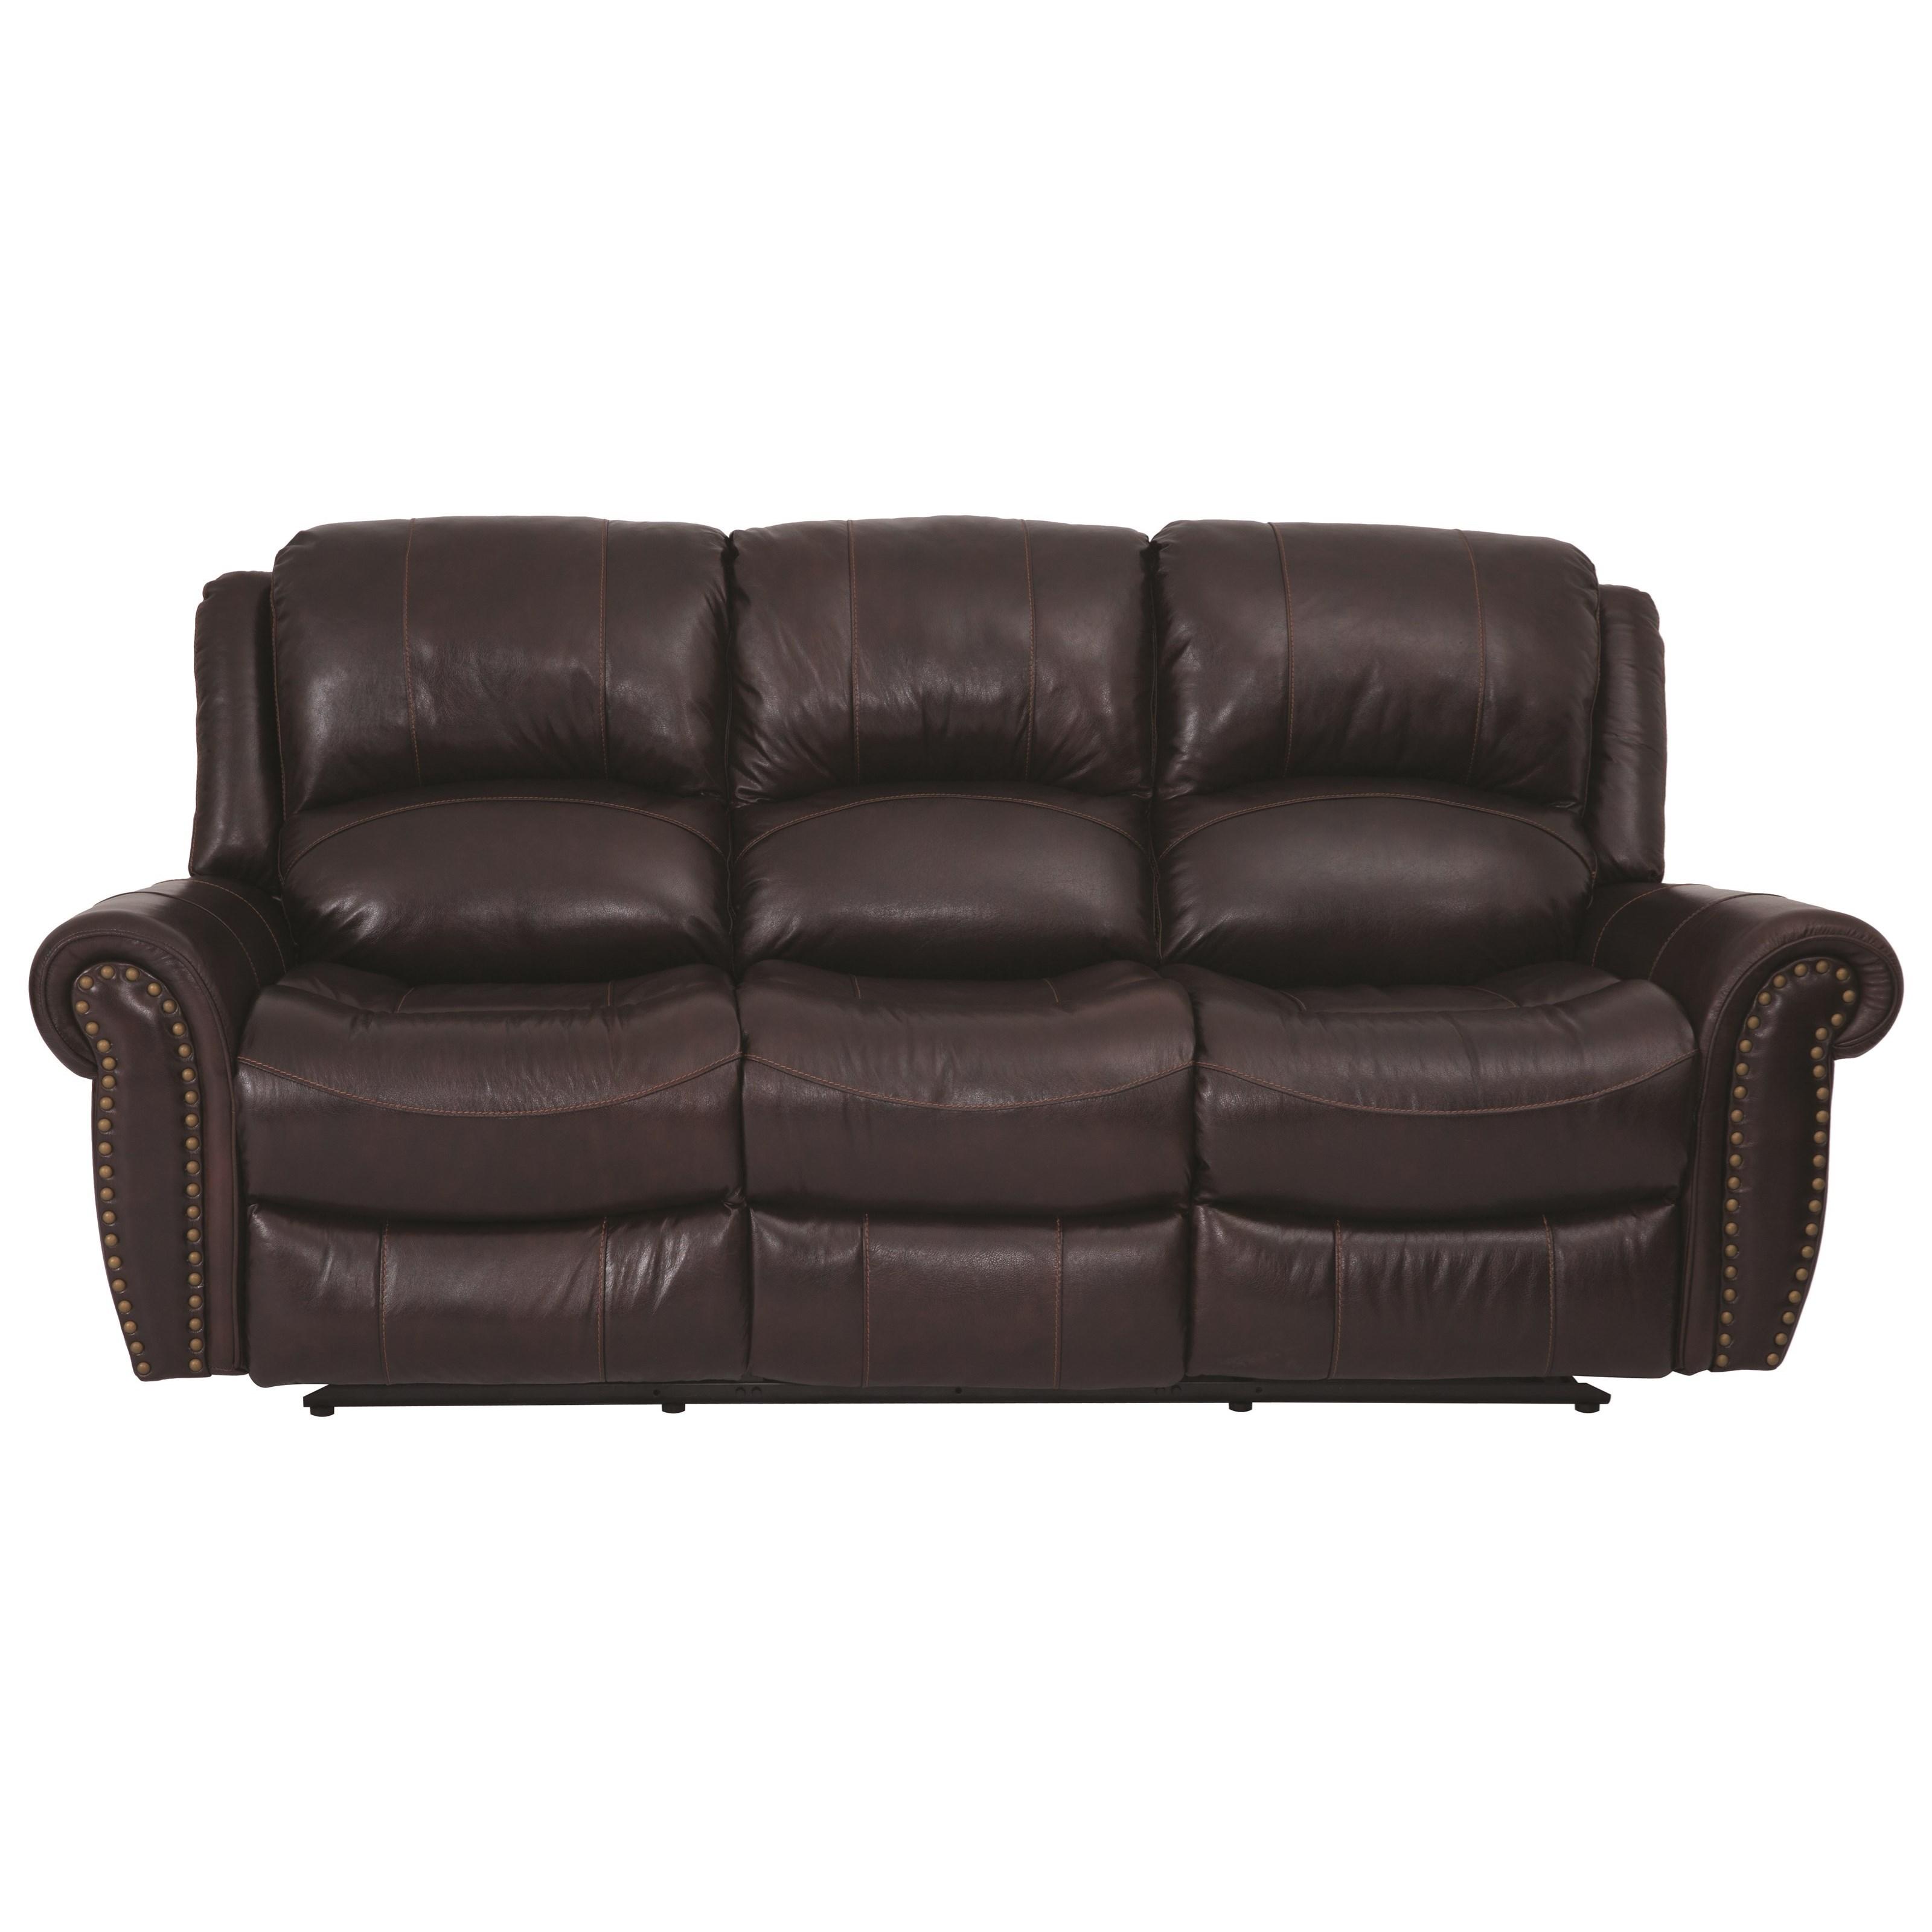 Cheers sofa cheers sofa u8625m l3 2e 3 seater recliner for Furniture 60618